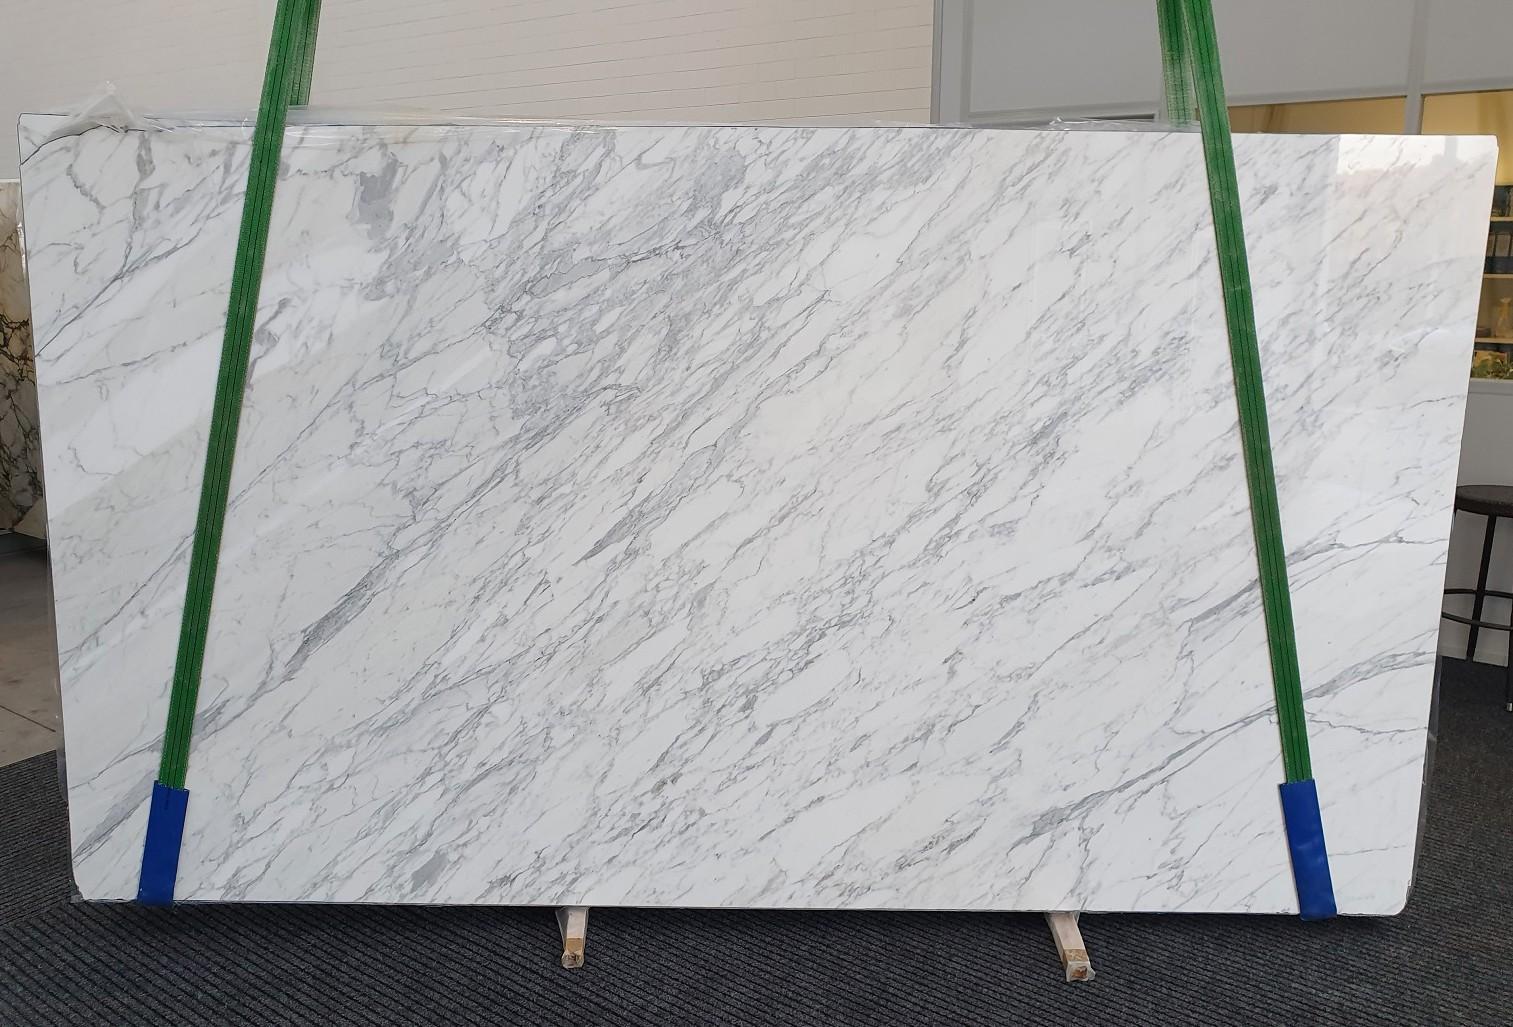 CALACATTA CARRARA Suministro Veneto (Italia) de planchas pulidas en mármol natural 1295 , Slab #24